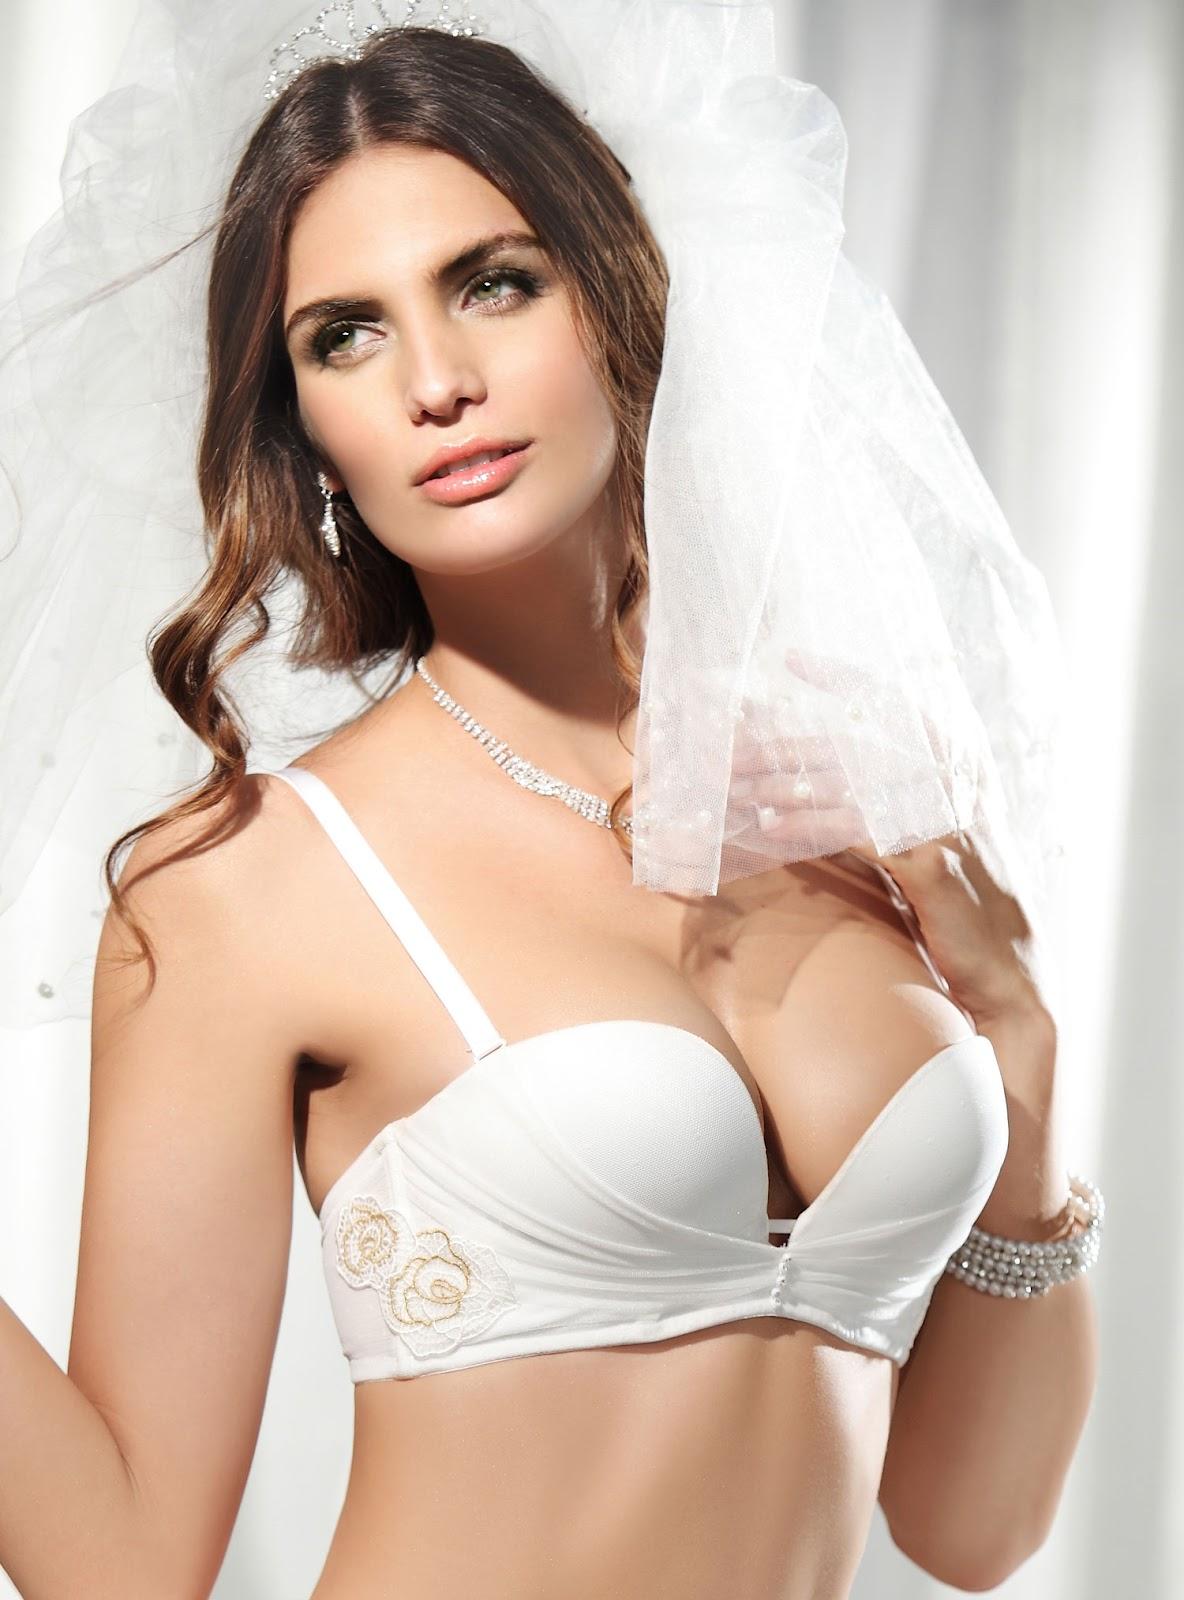 Womens Lingerie Fashions, Bridal Lingerie, Sleepwear -2232